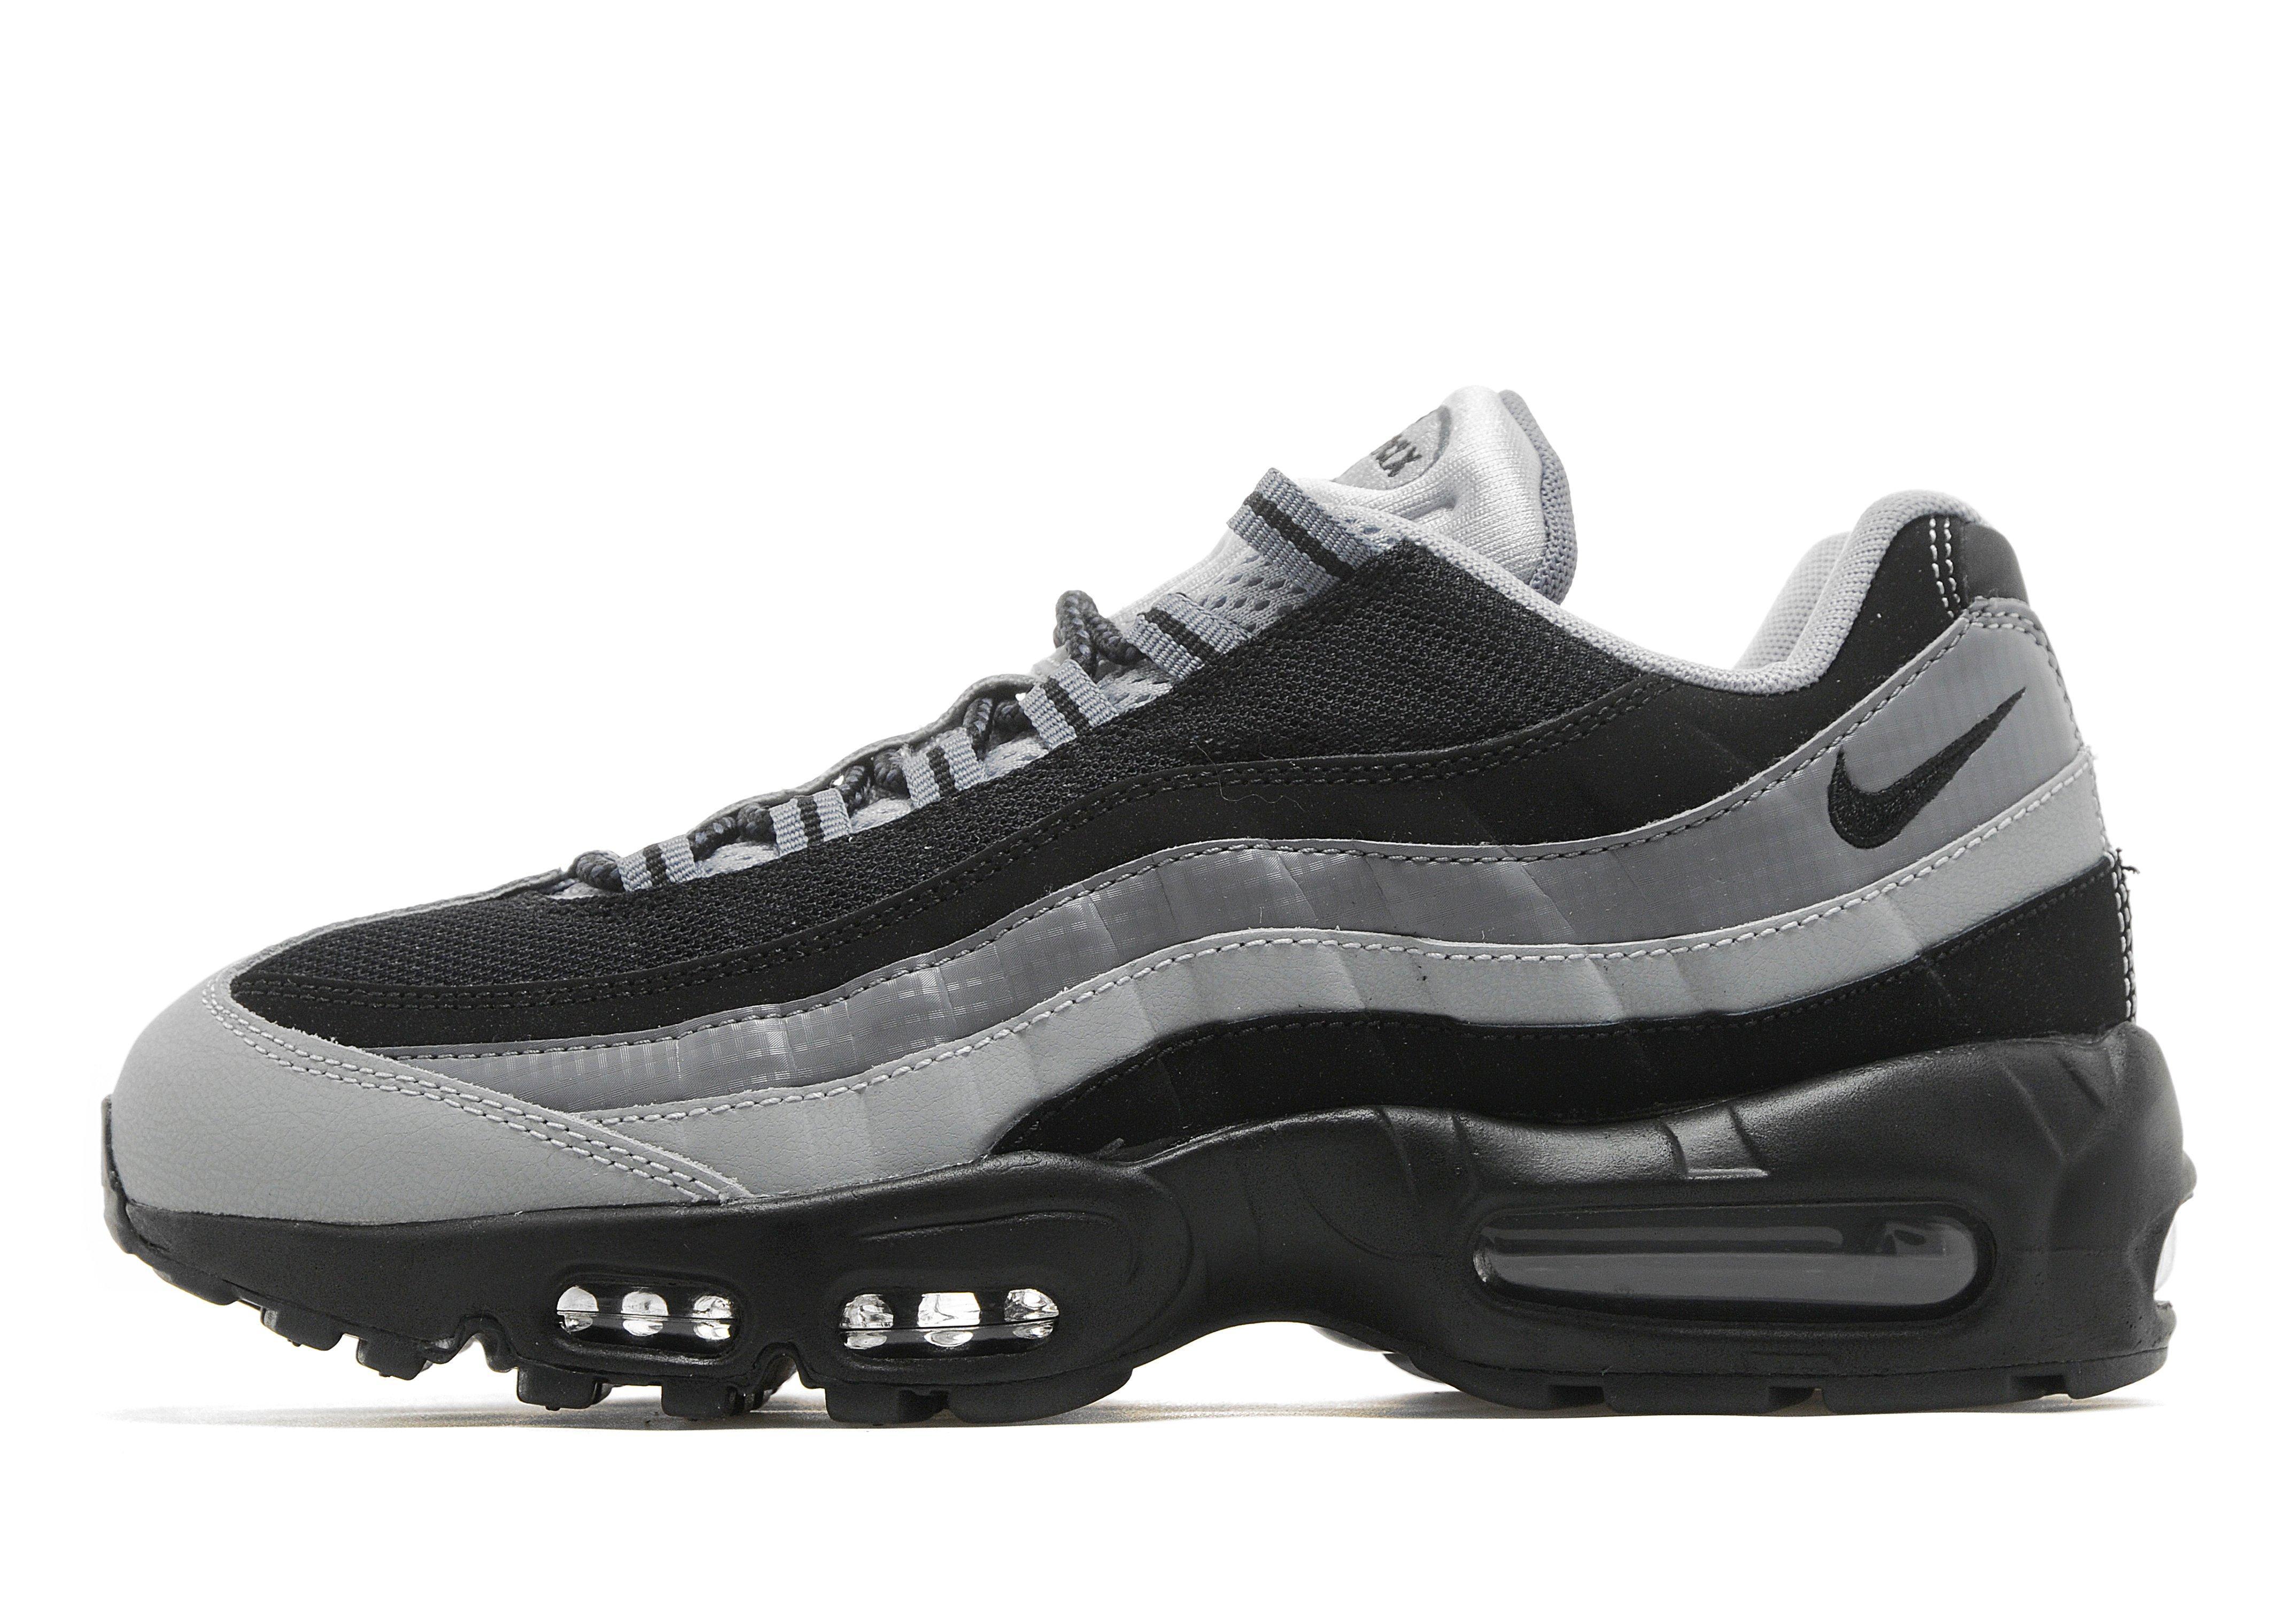 air max 95 grey and black